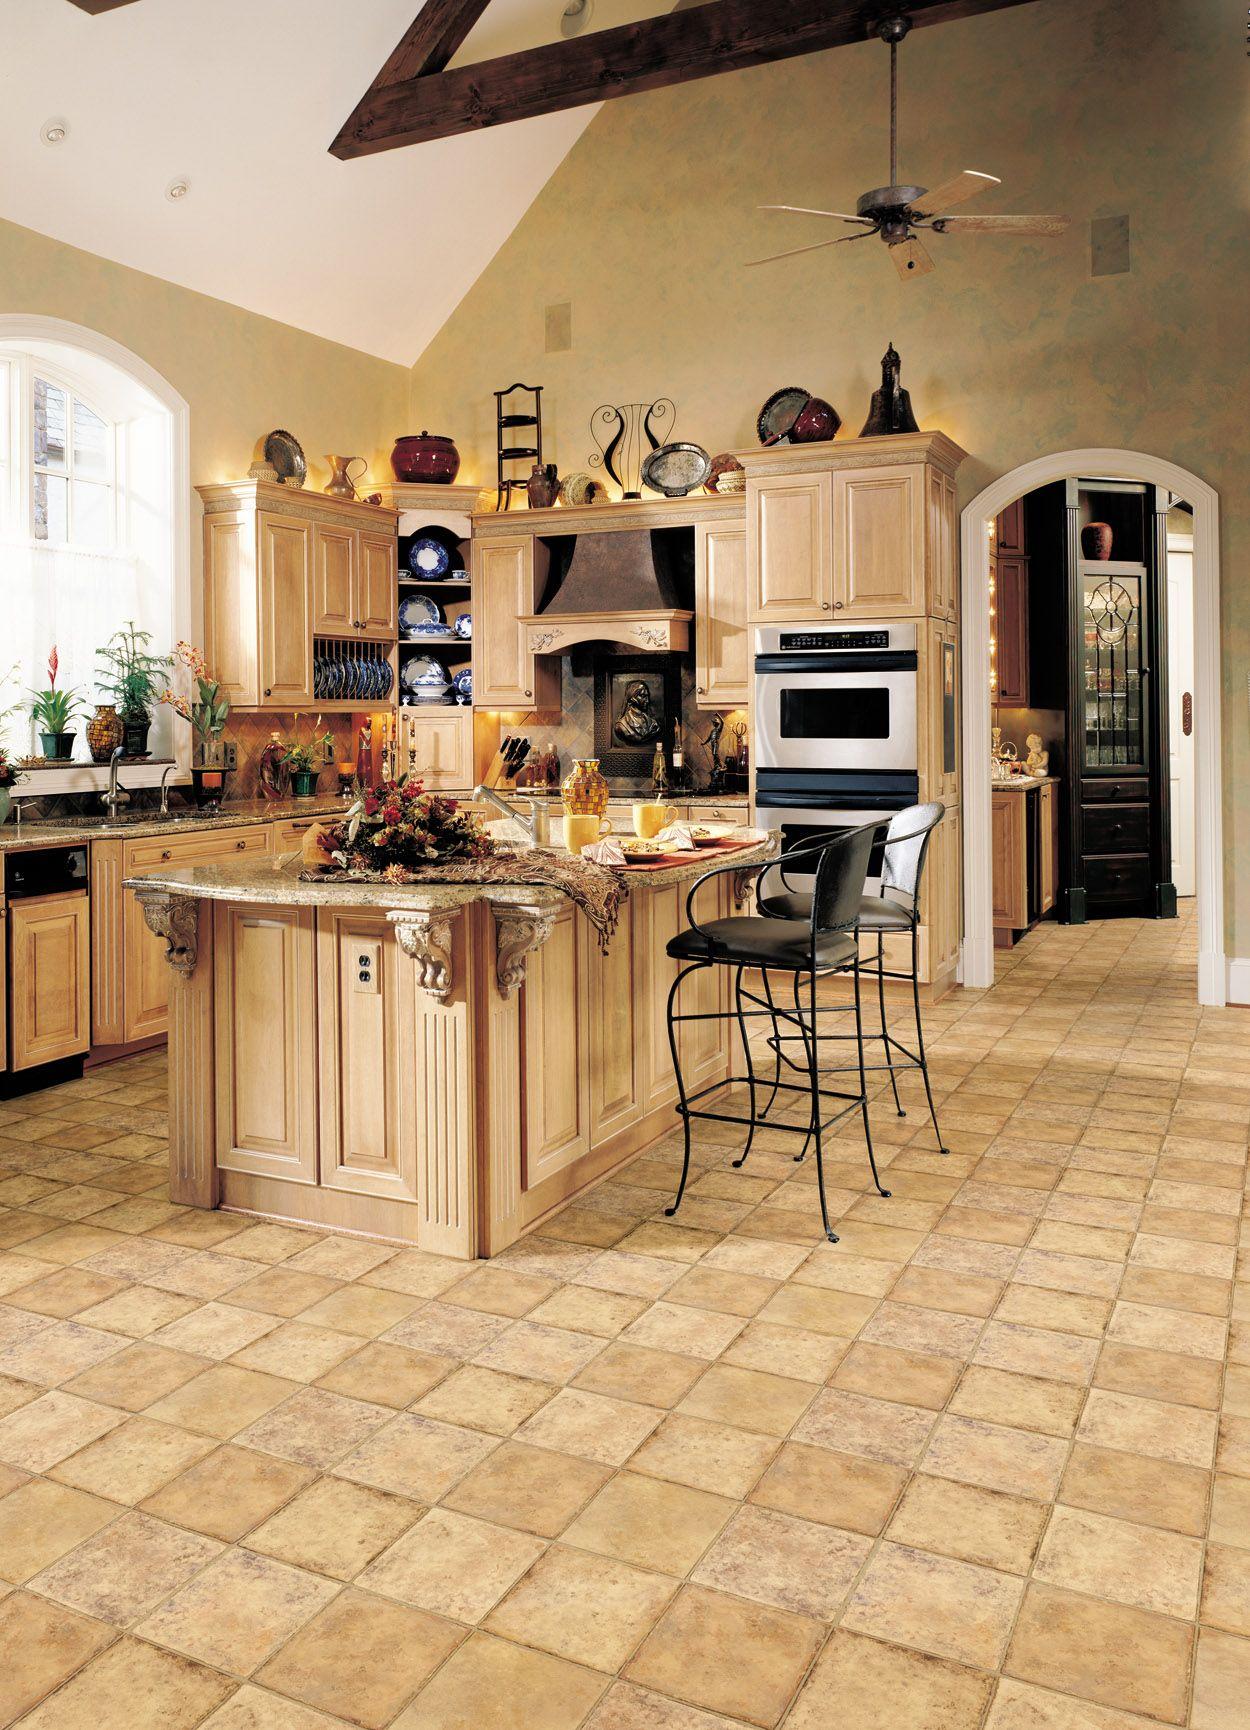 congoleum gallery kitchen vinyl vinyl flooring kitchen kitchen flooring on kitchen remodel vinyl flooring id=13876